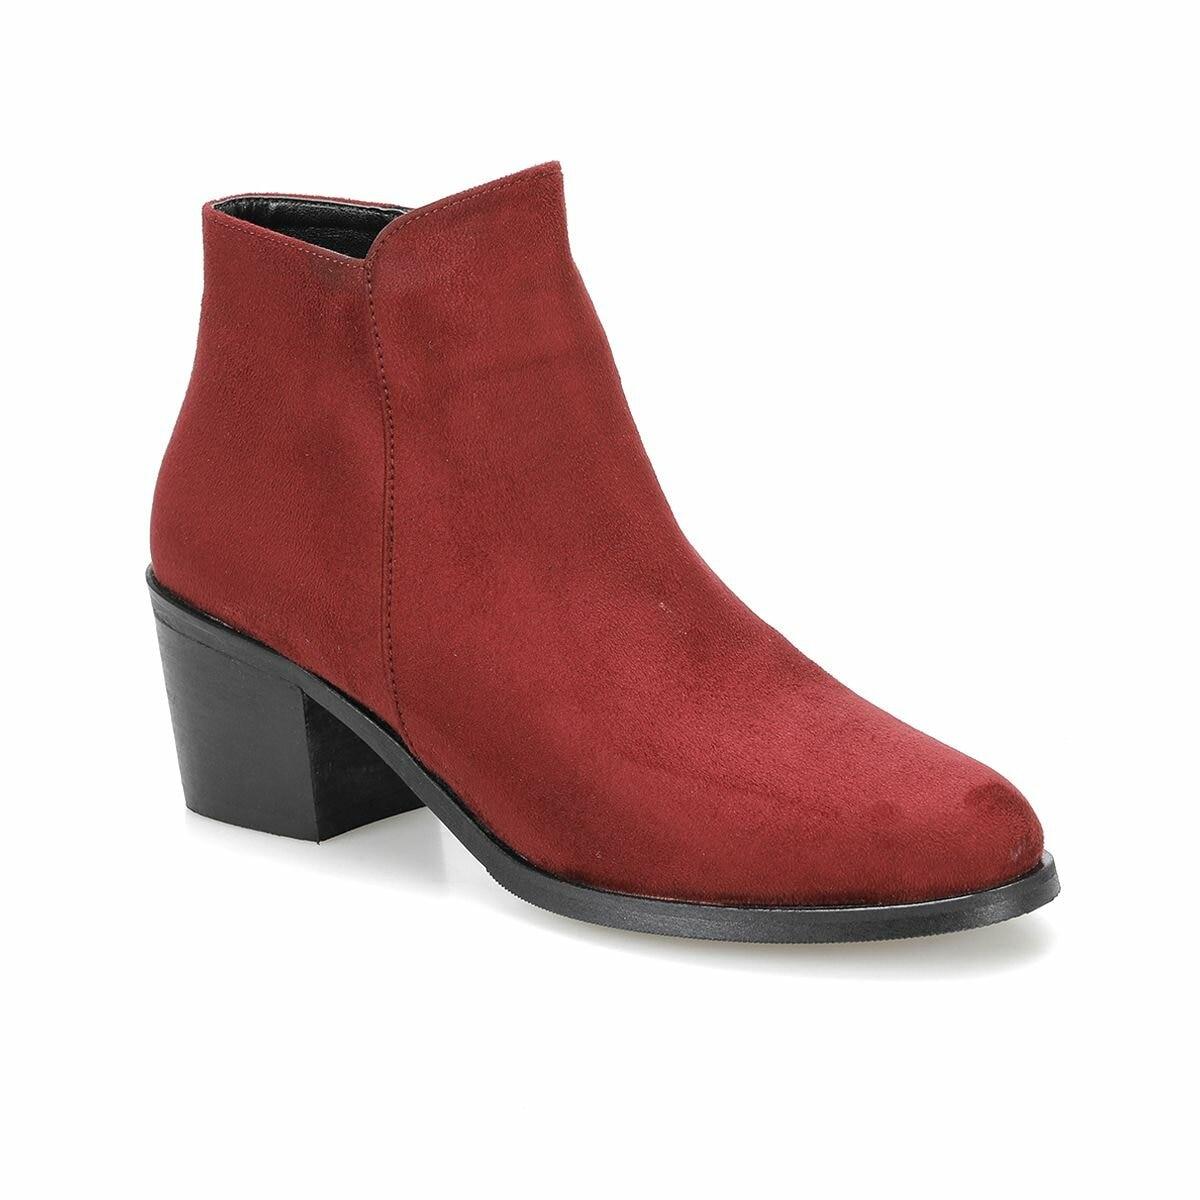 FLO COXWELL31Z SKIN Maroon Women 'S Boots BUTIGO